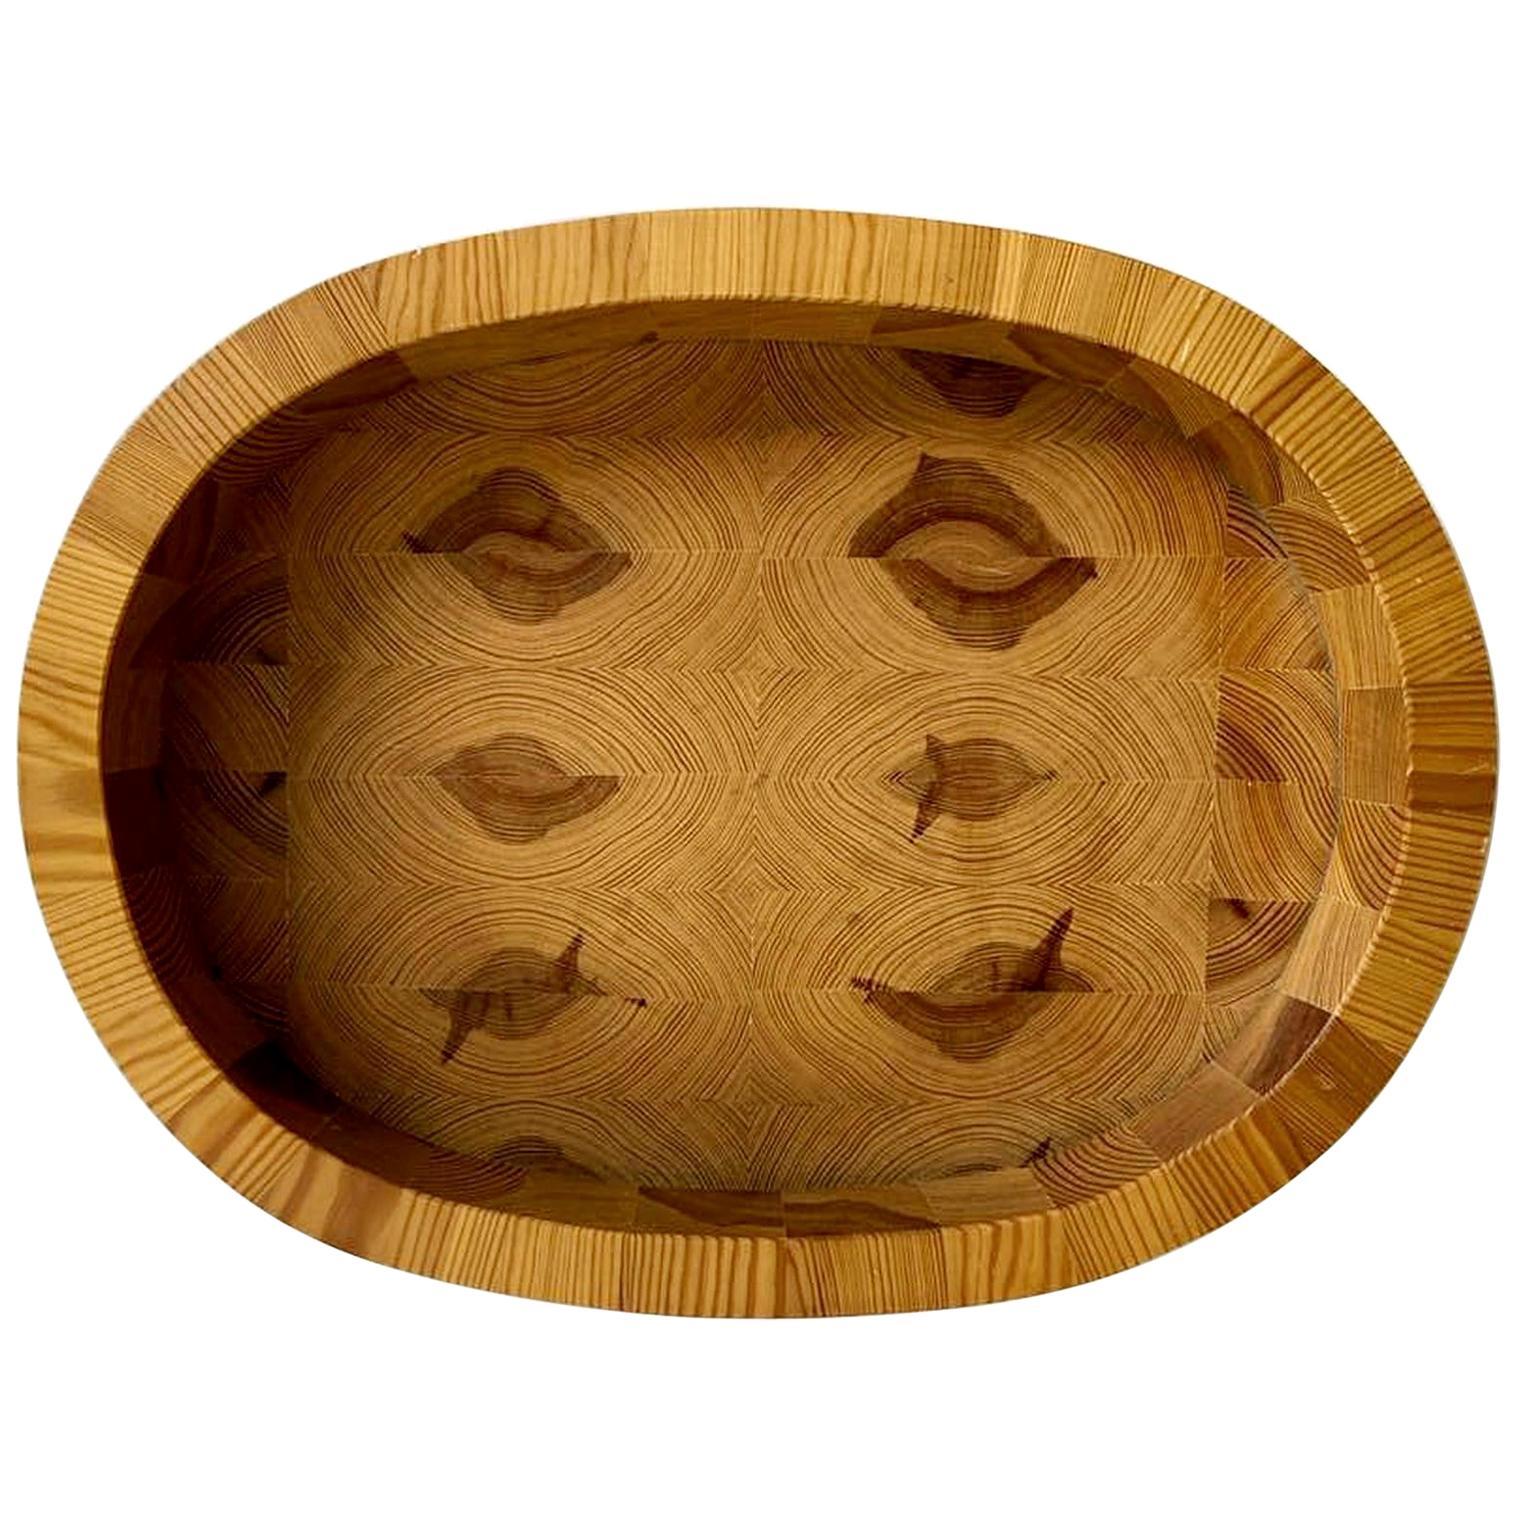 Swedish Handmade Bowl in Pine, Kinfolk Style, circa 1970